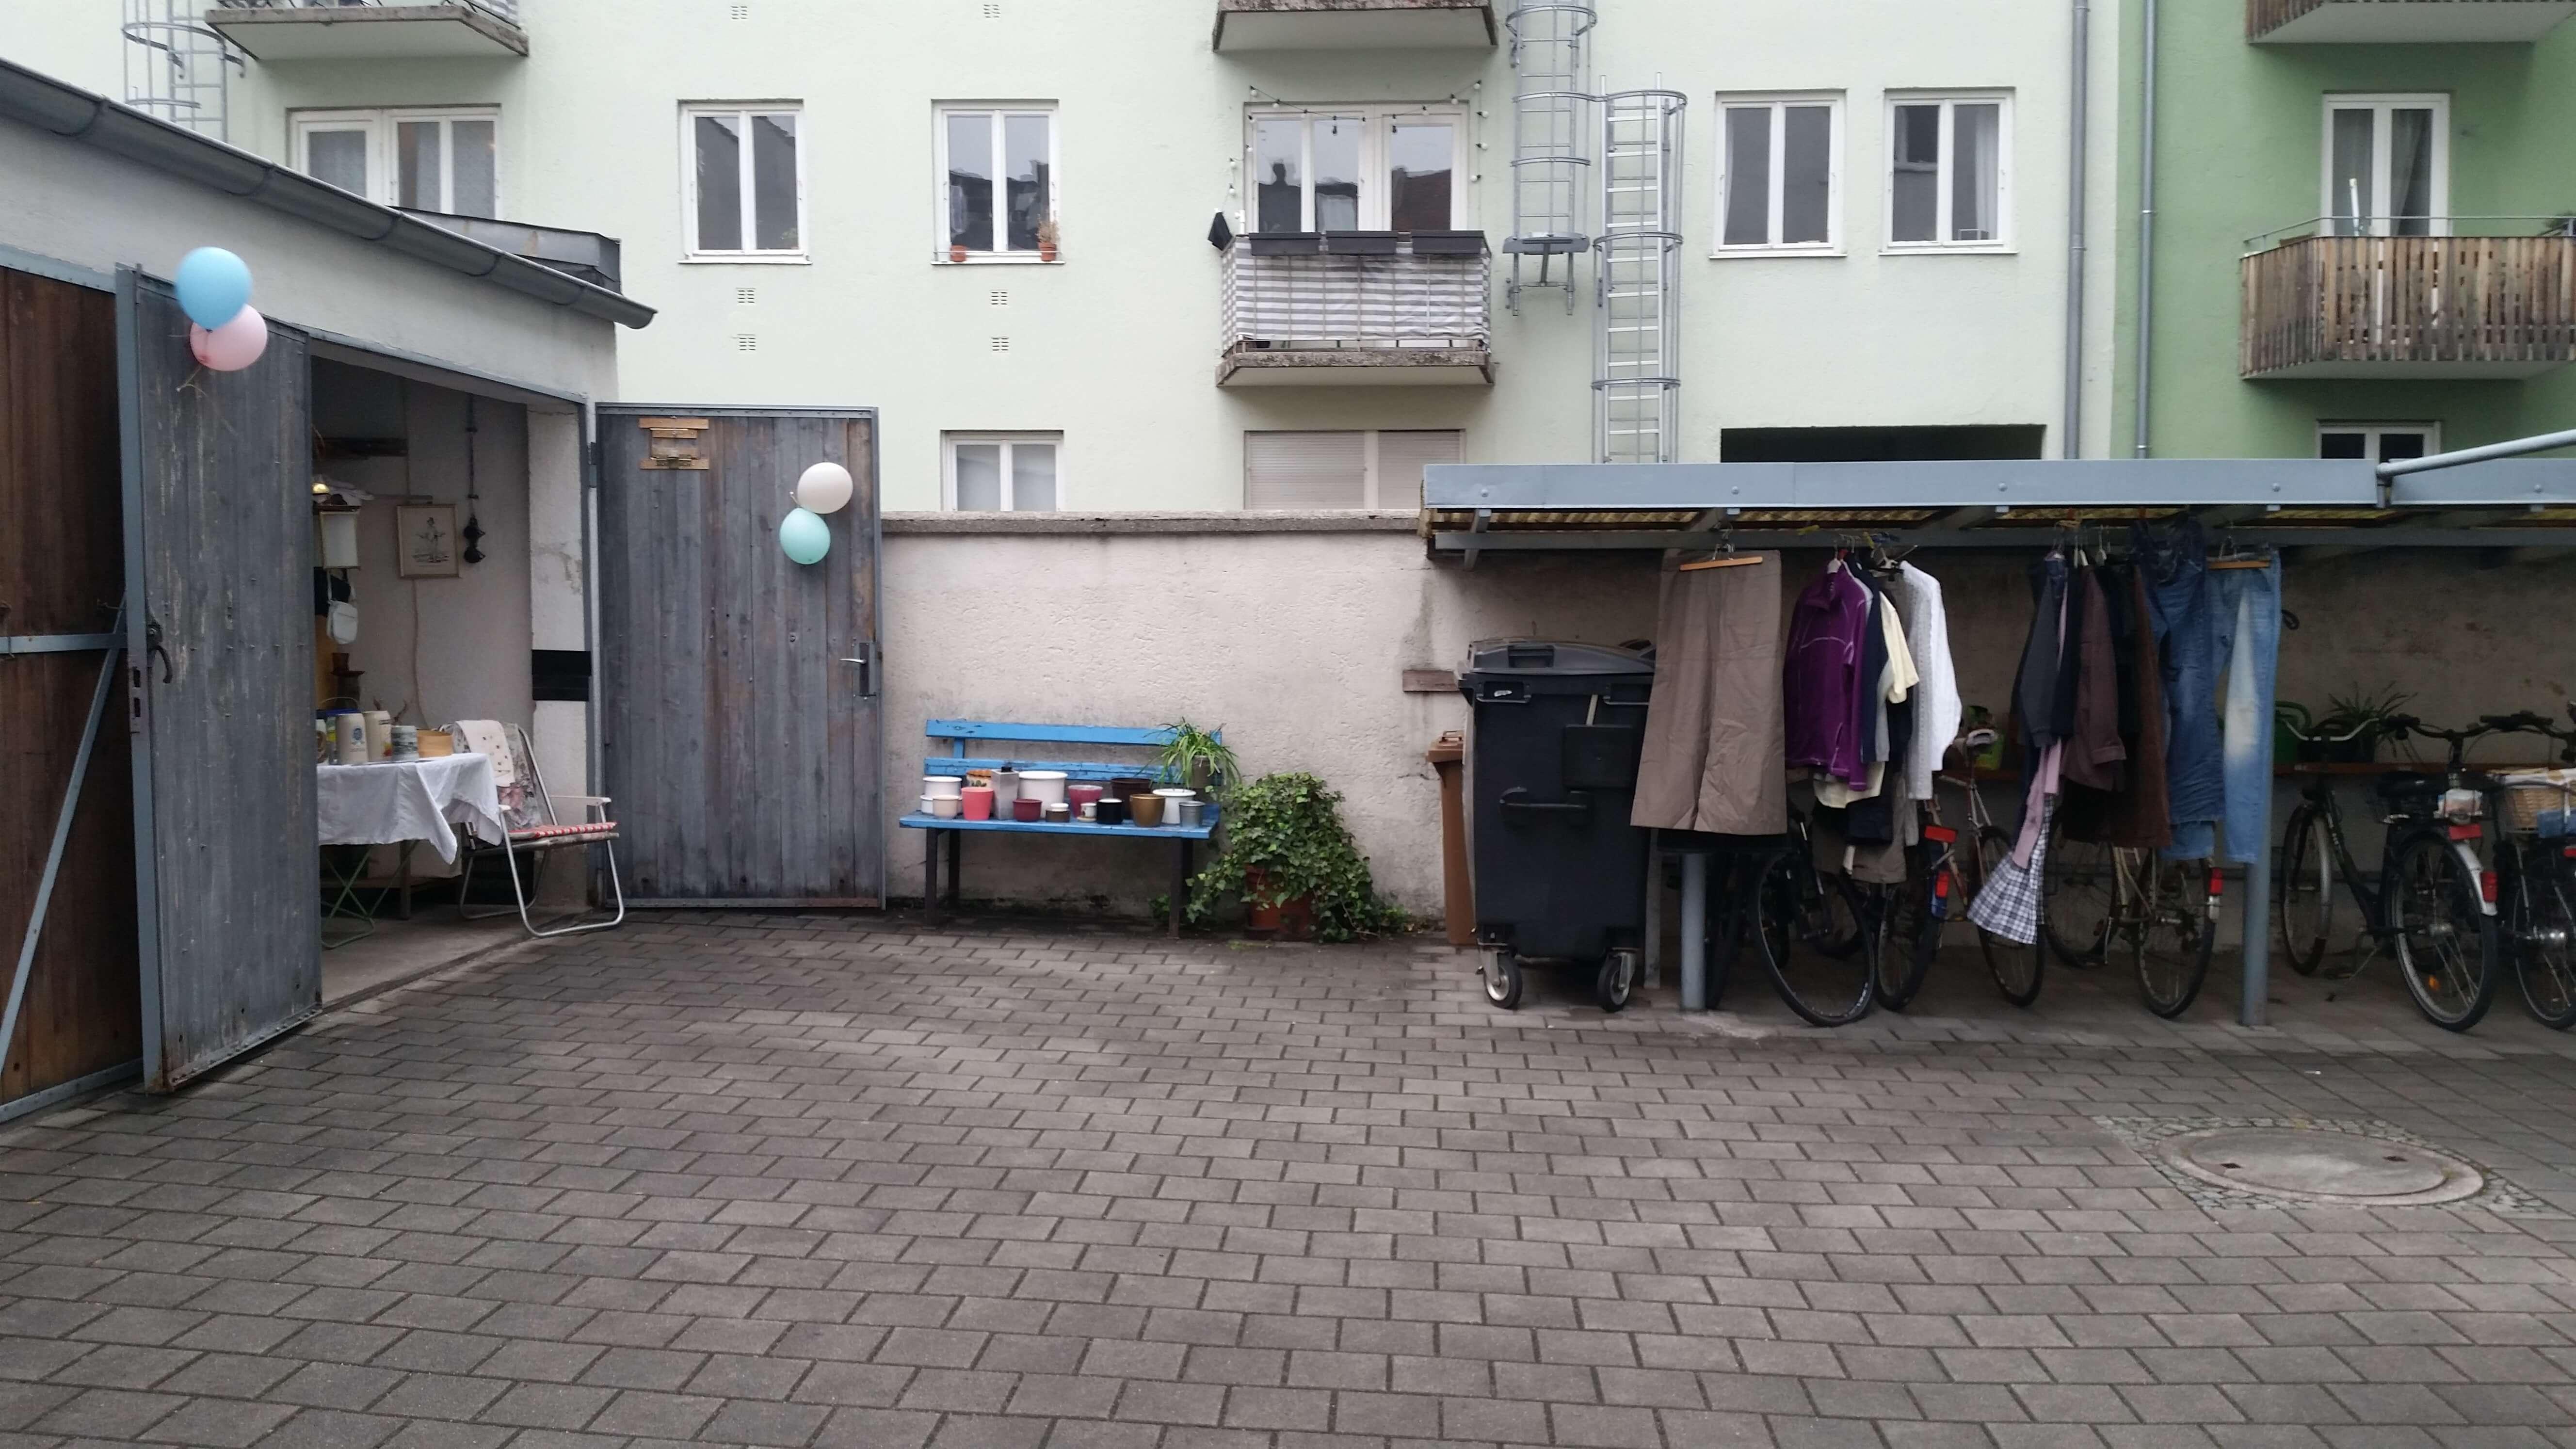 Munich Courtyard and Garden Flea Markets